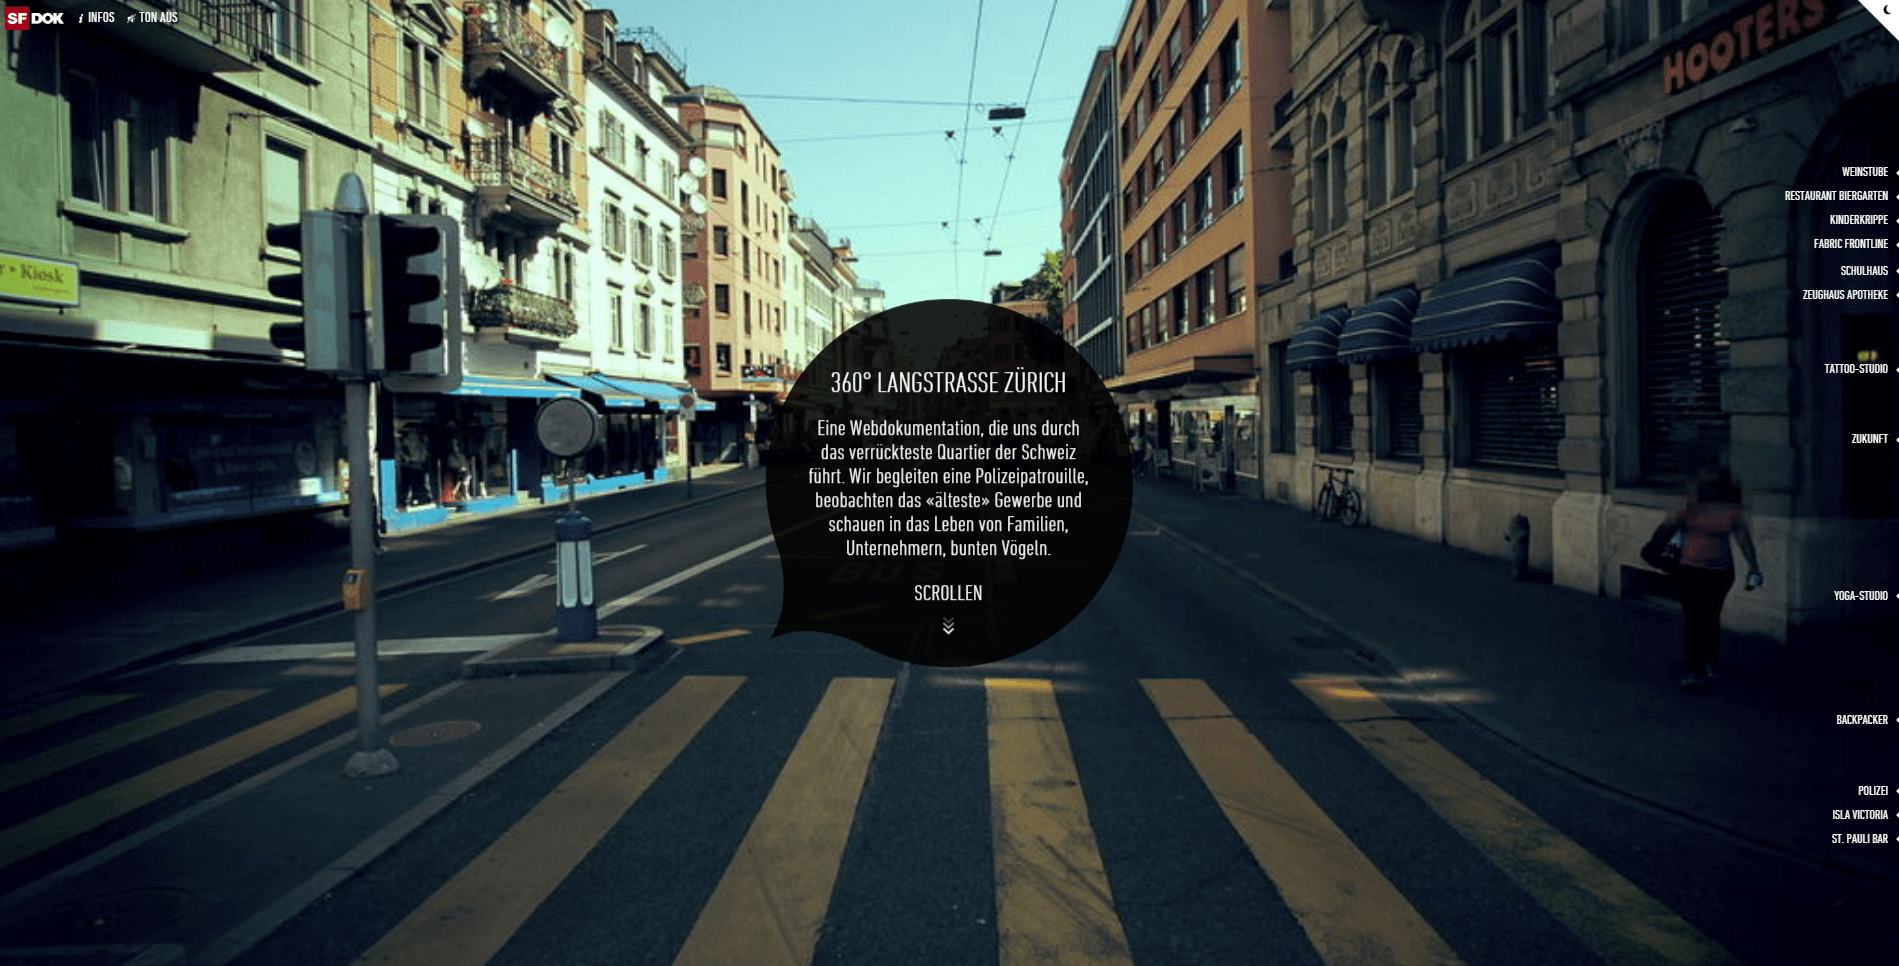 Site 360° LANGSTRASSE ZÜRICH - 9 Sites incríveis para você se inspirar